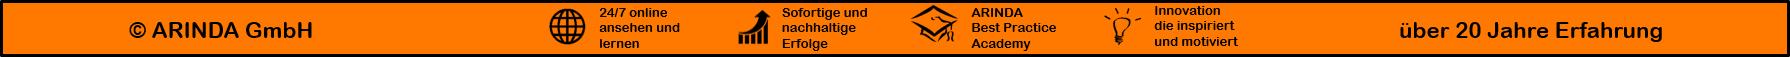 Banner ARINDA Academy